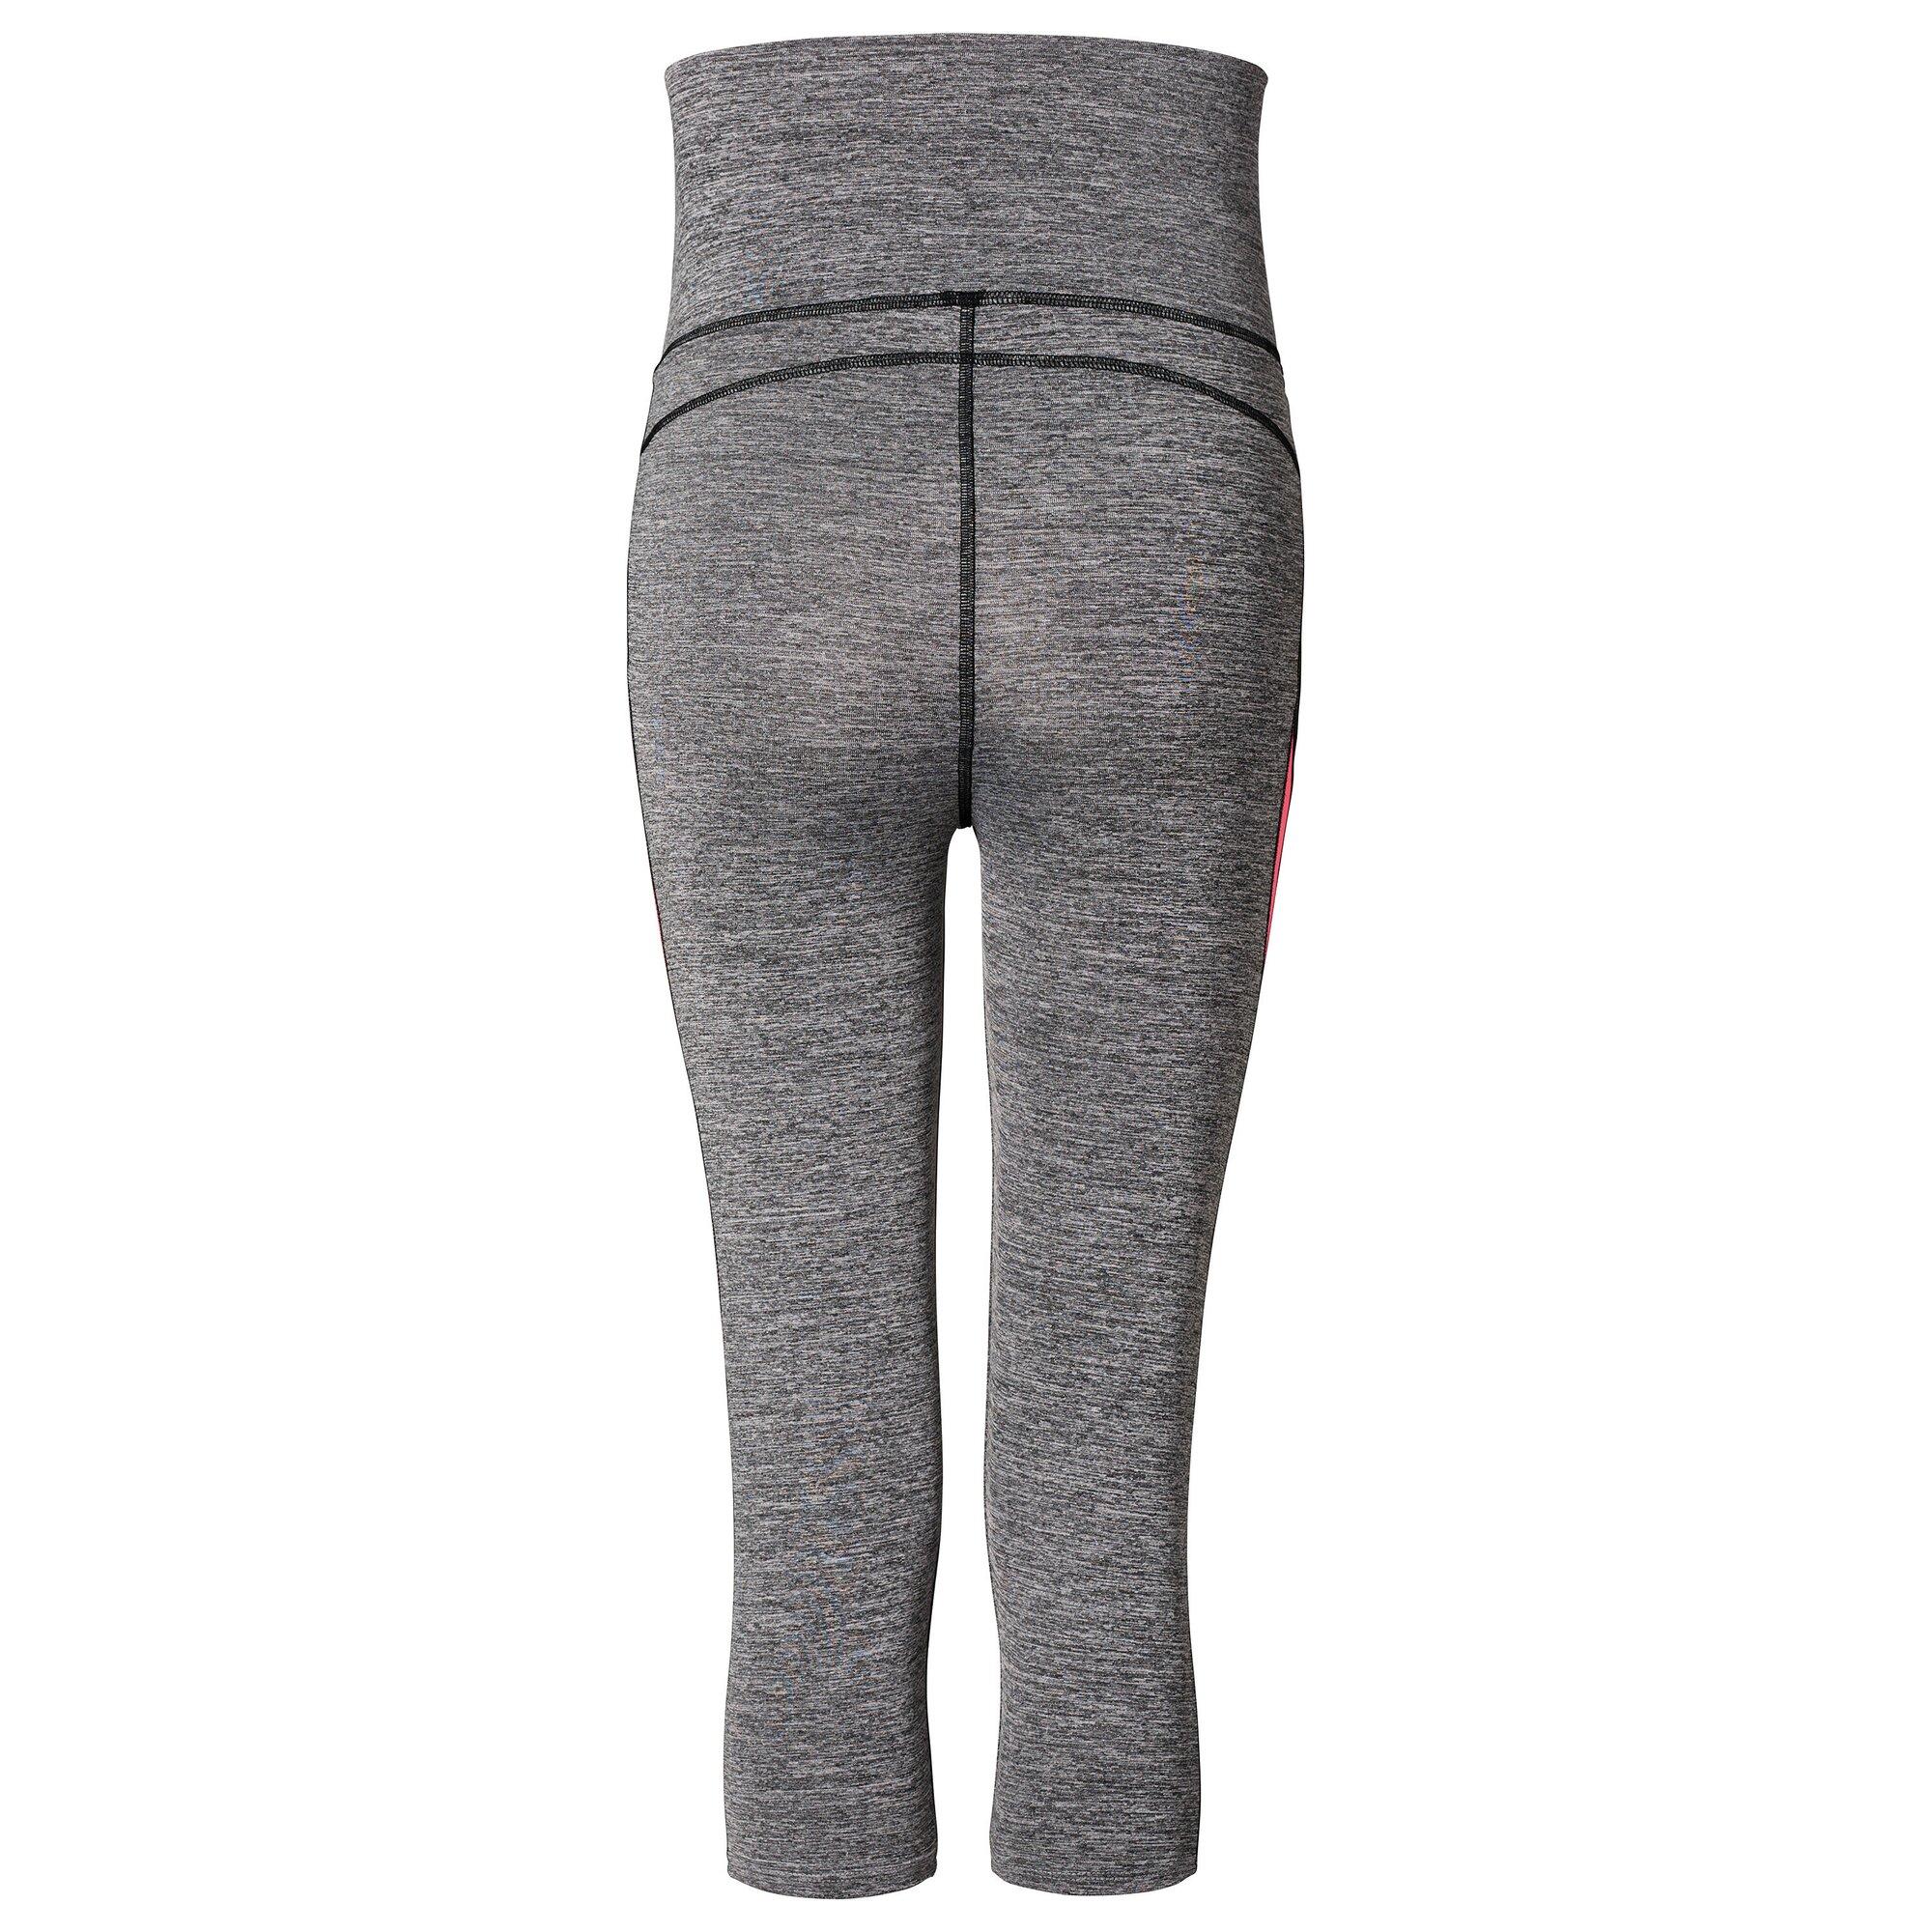 noppies-sport-legging-fenna, 39.99 EUR @ babywalz-de